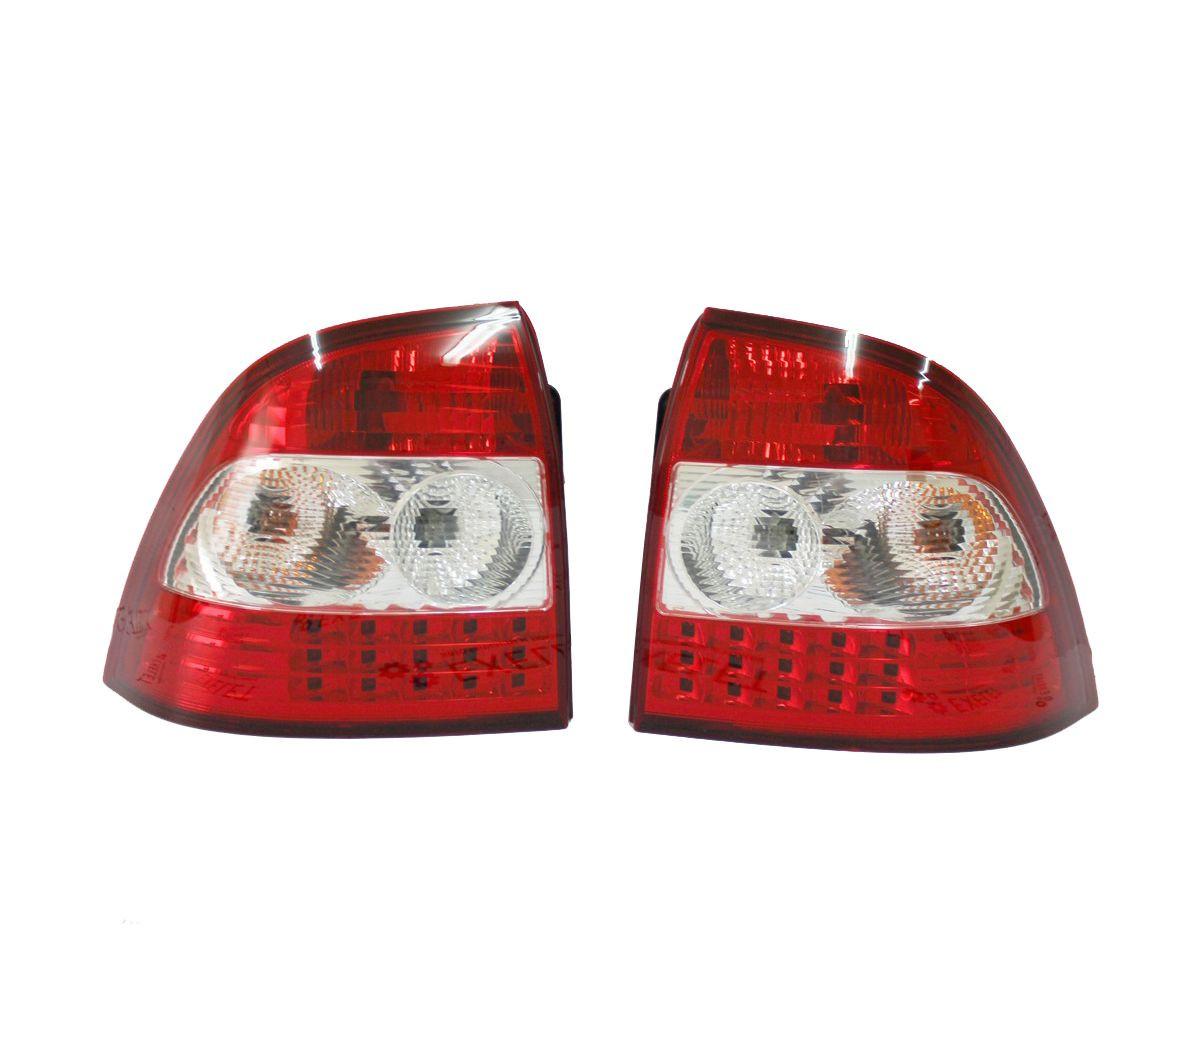 TAILLIGHTS LED TUNING LADA PRIORA 2170